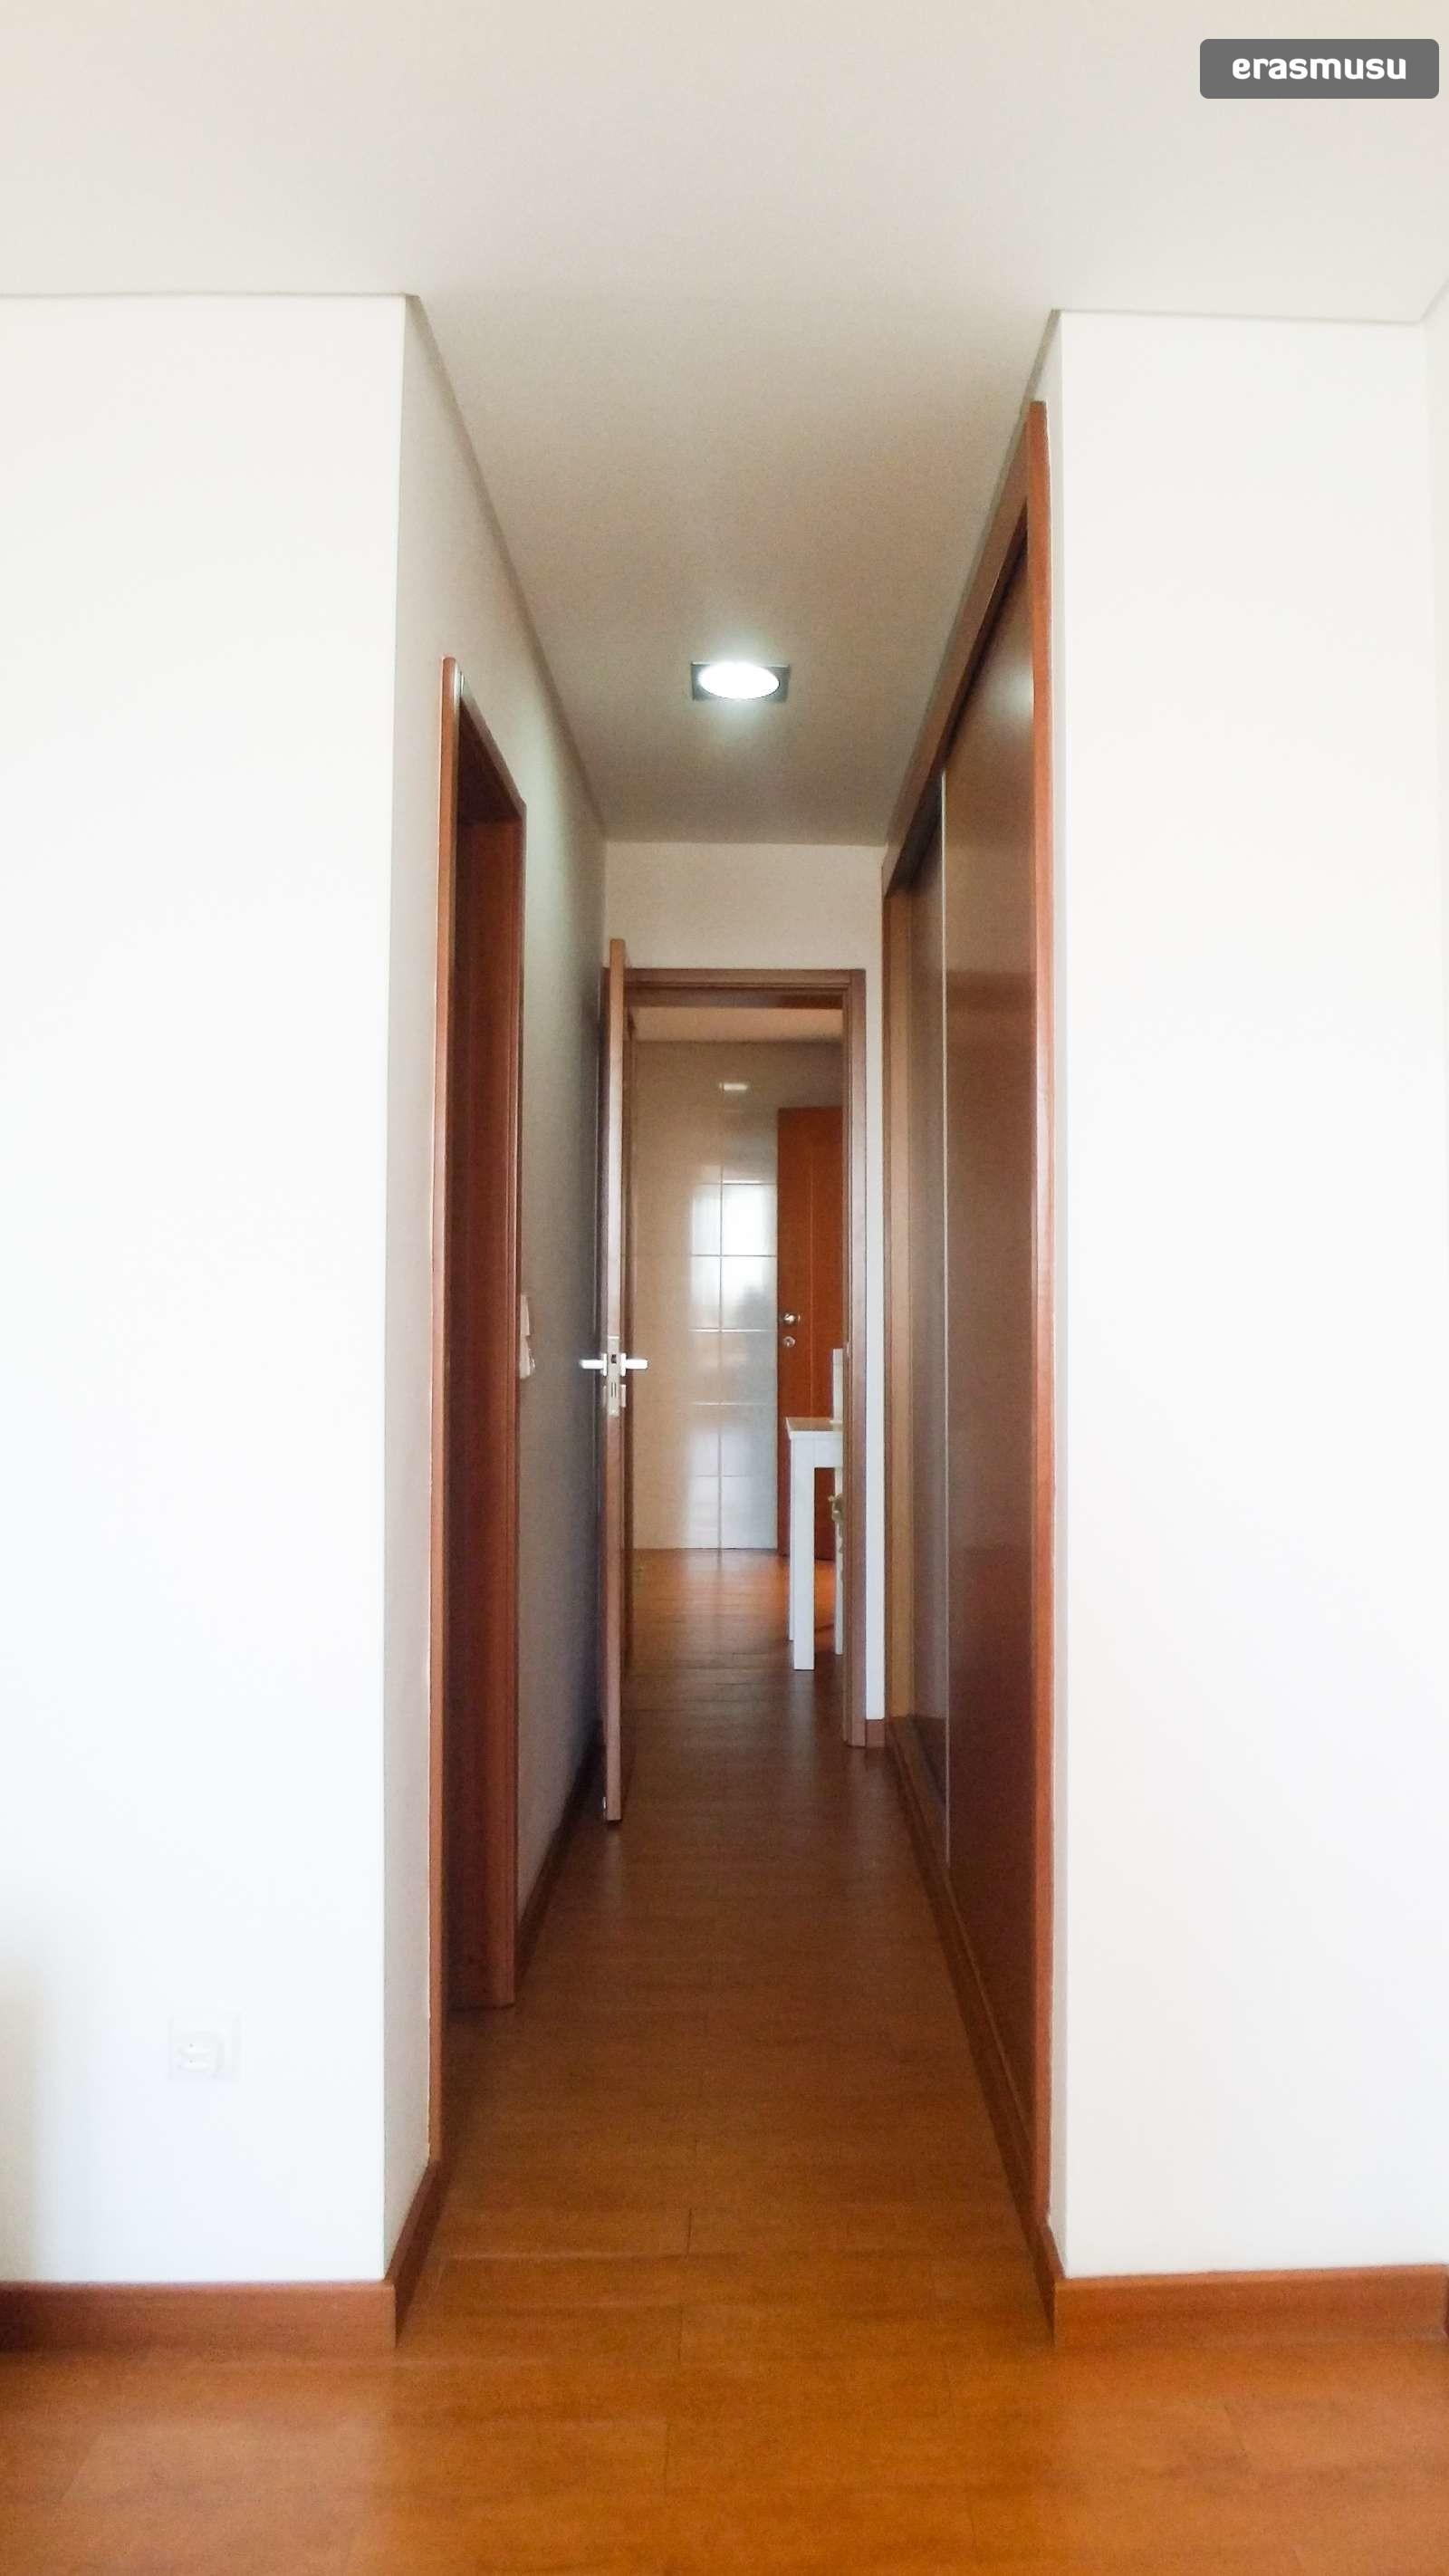 bright-studio-apartment-rent-cedofeita-89f7e6a5218efdabb15807ca3